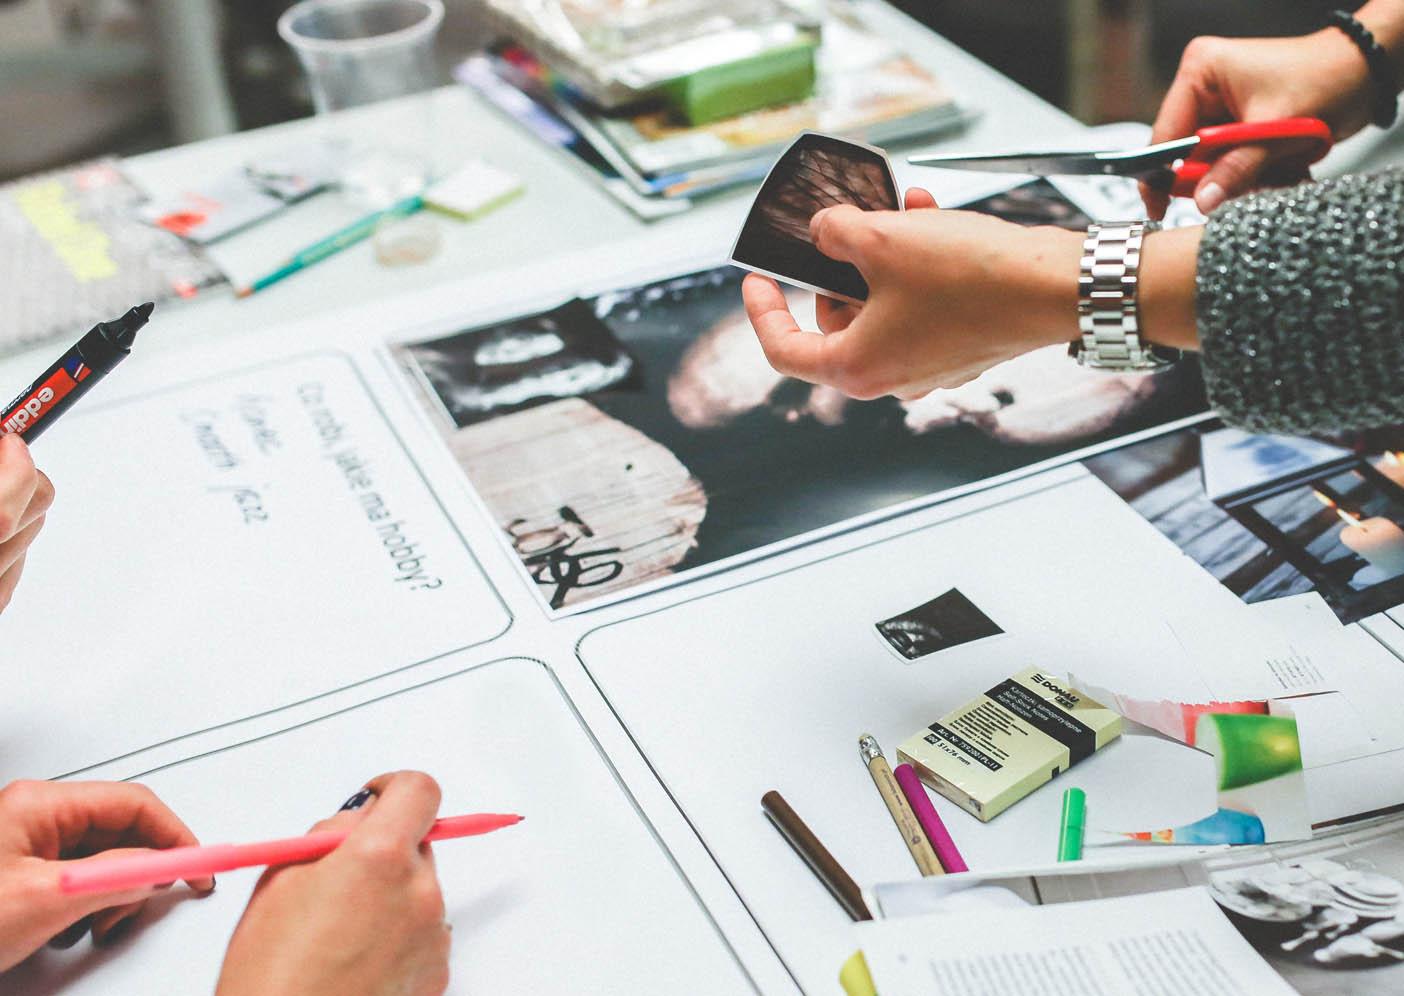 Design Process: Team working through the Design Process